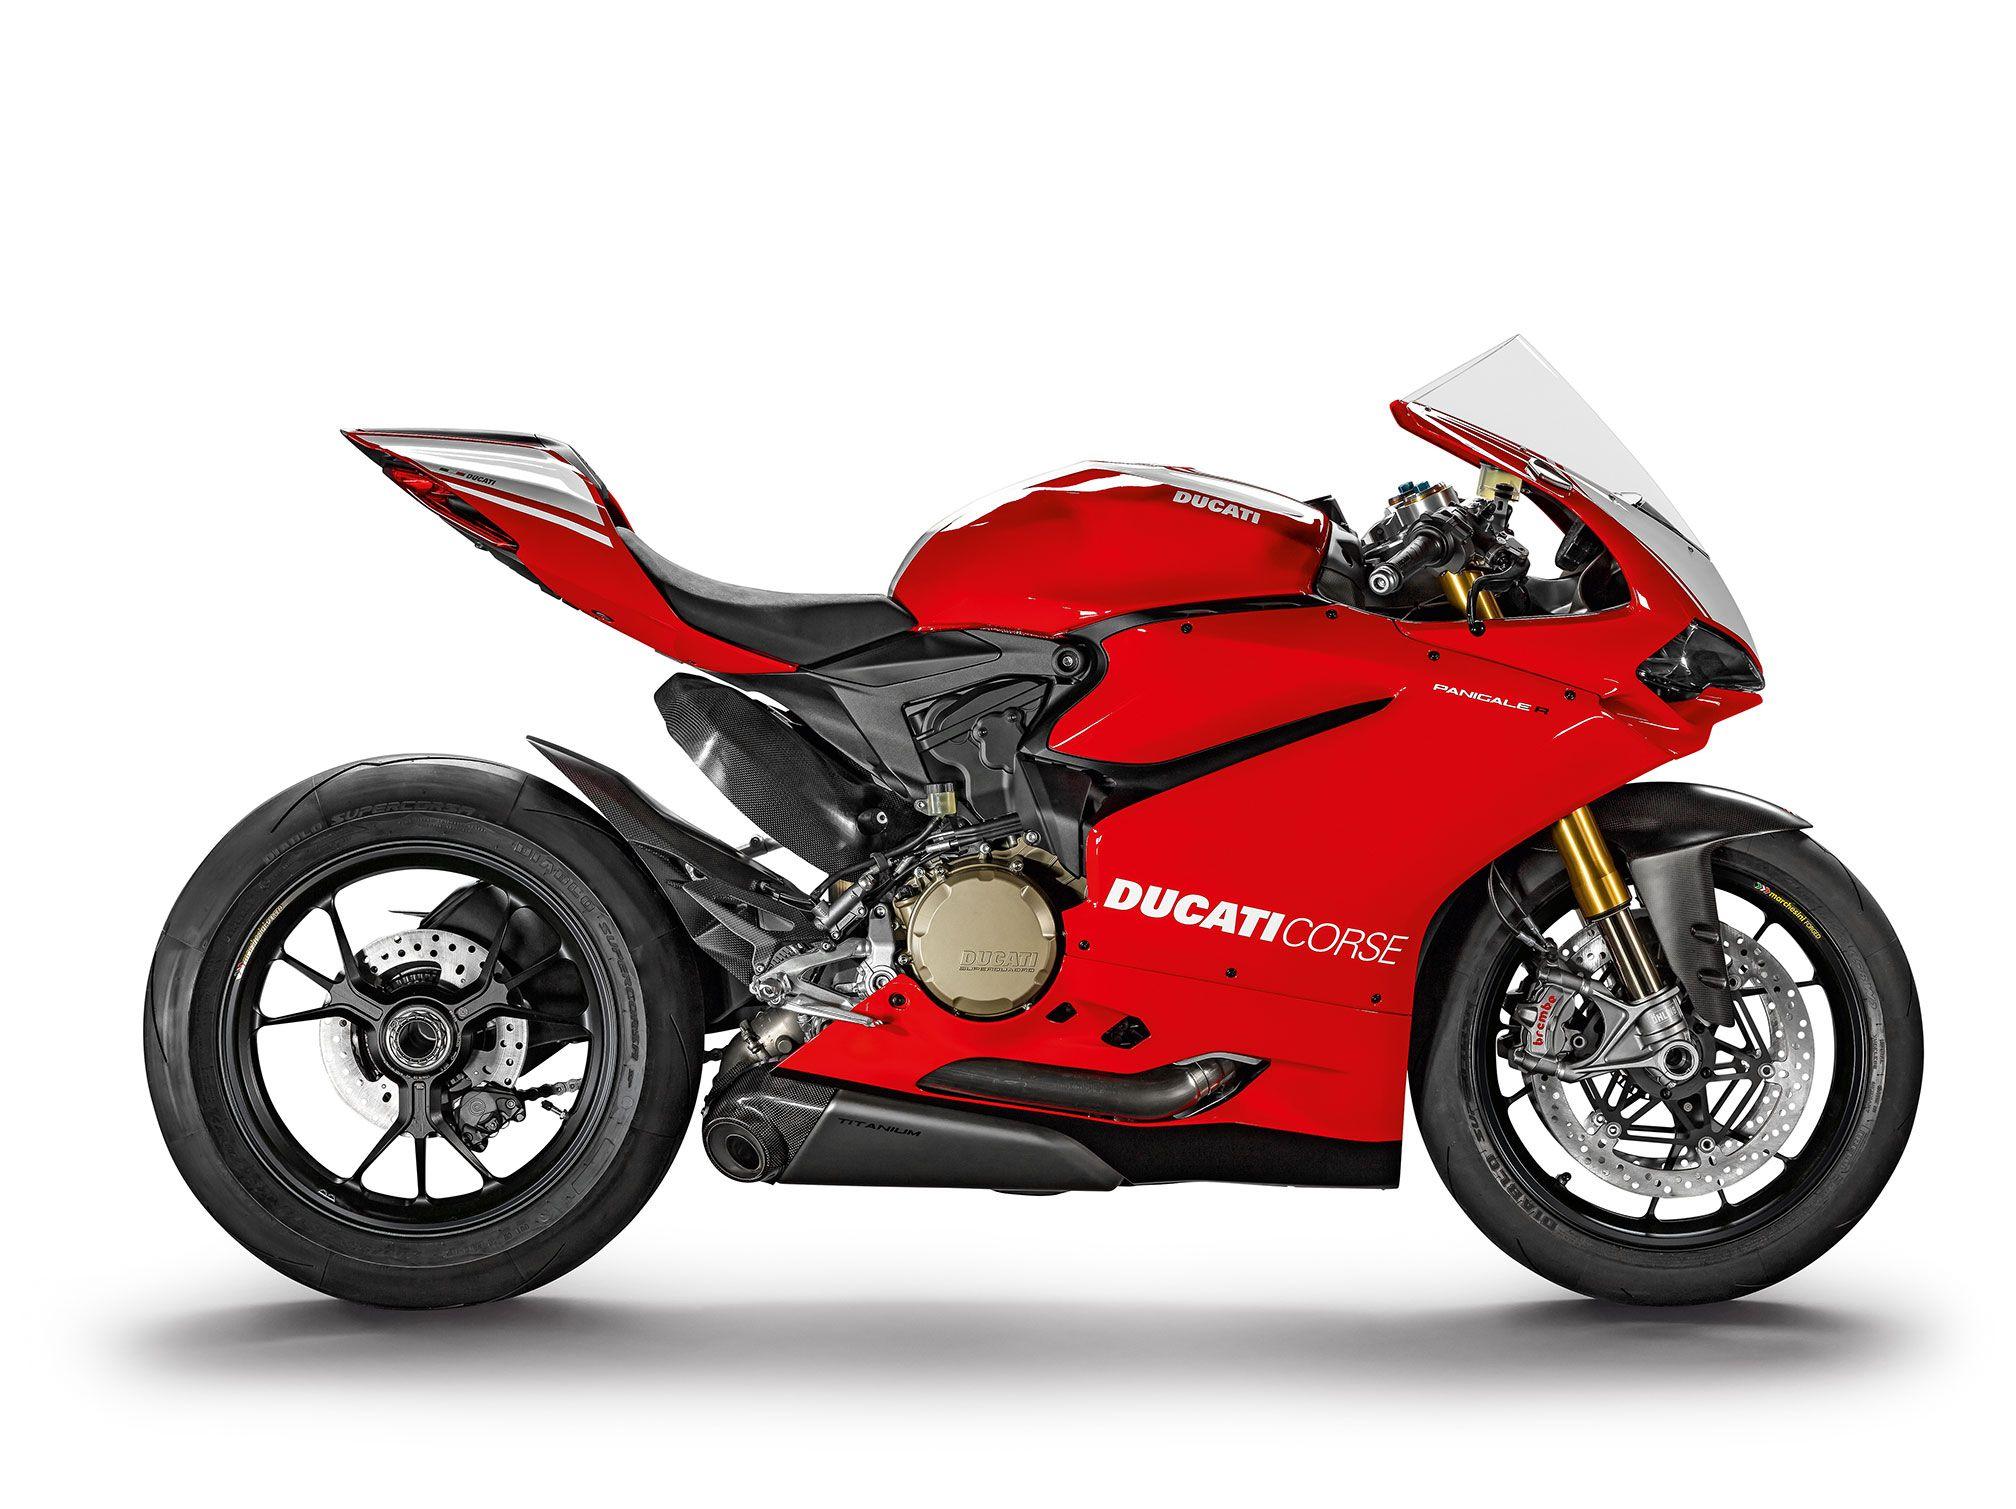 2016 Ducati 1198 Panigale R | Ducati Panigale Superbike ...